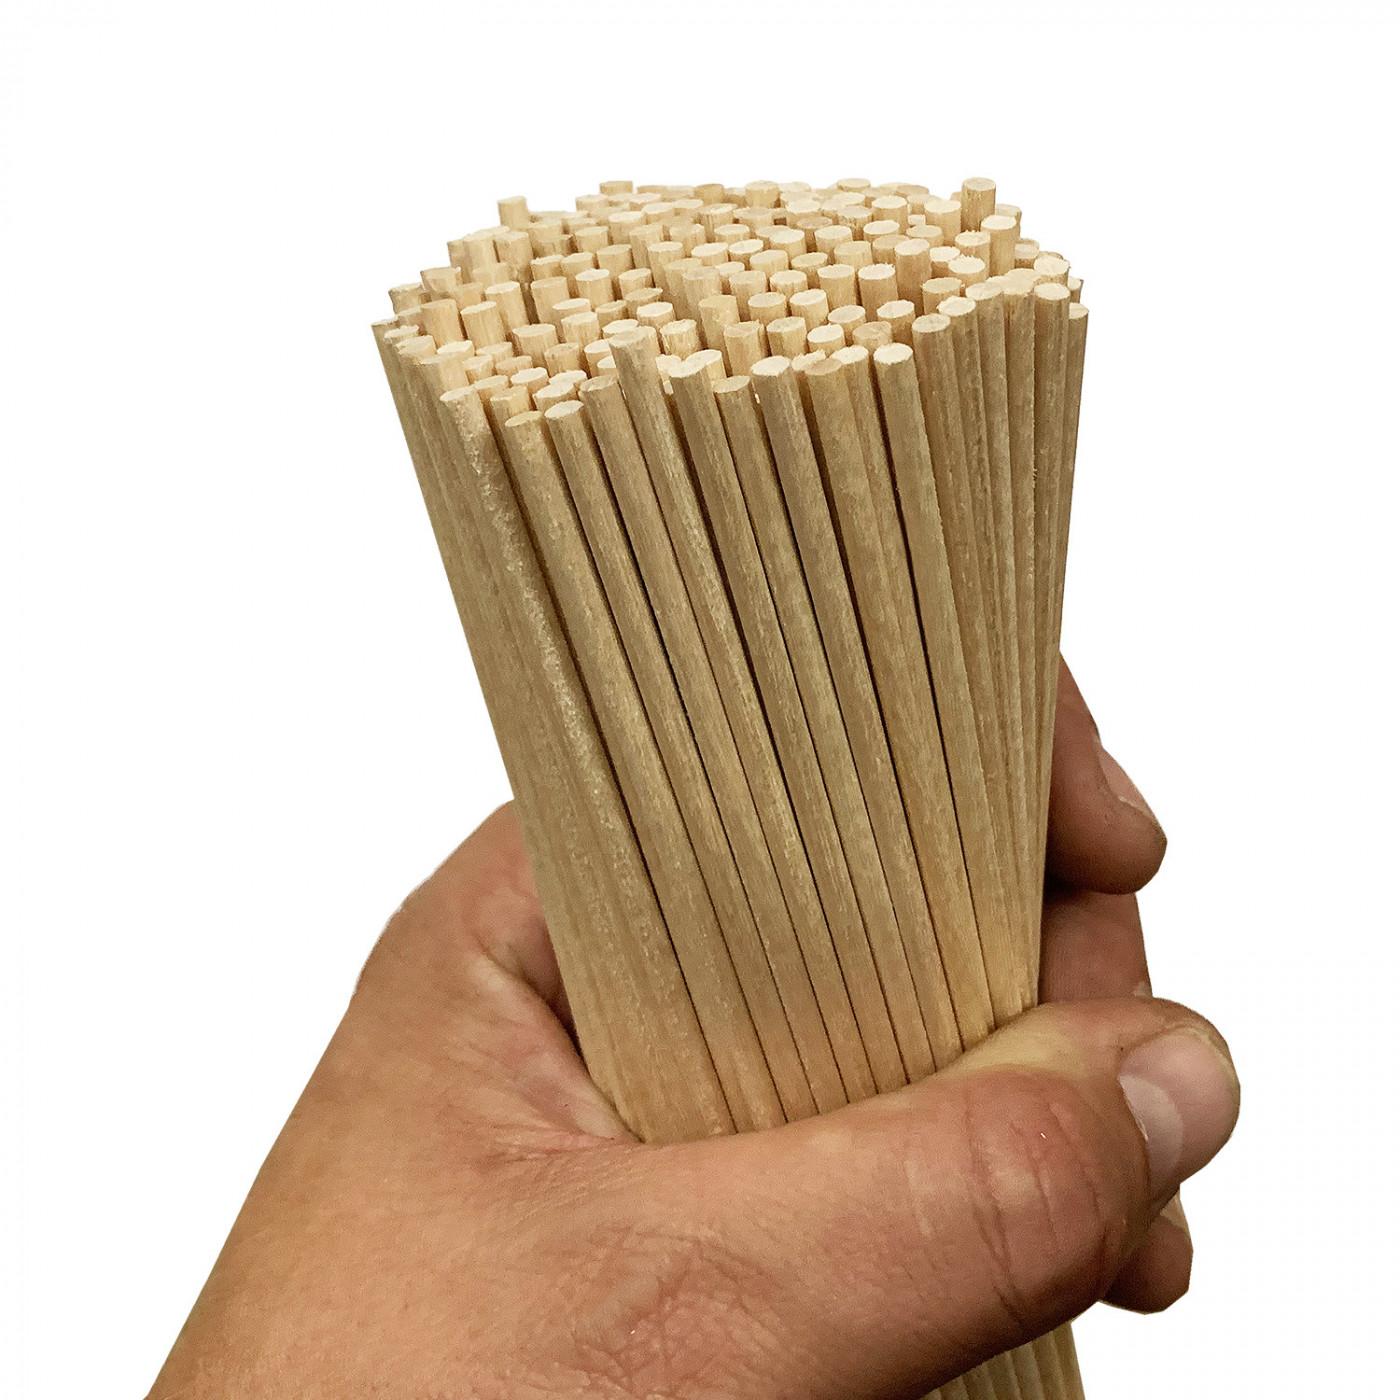 Set of 250 wooden sticks (5 mm x 20 cm, birch wood)